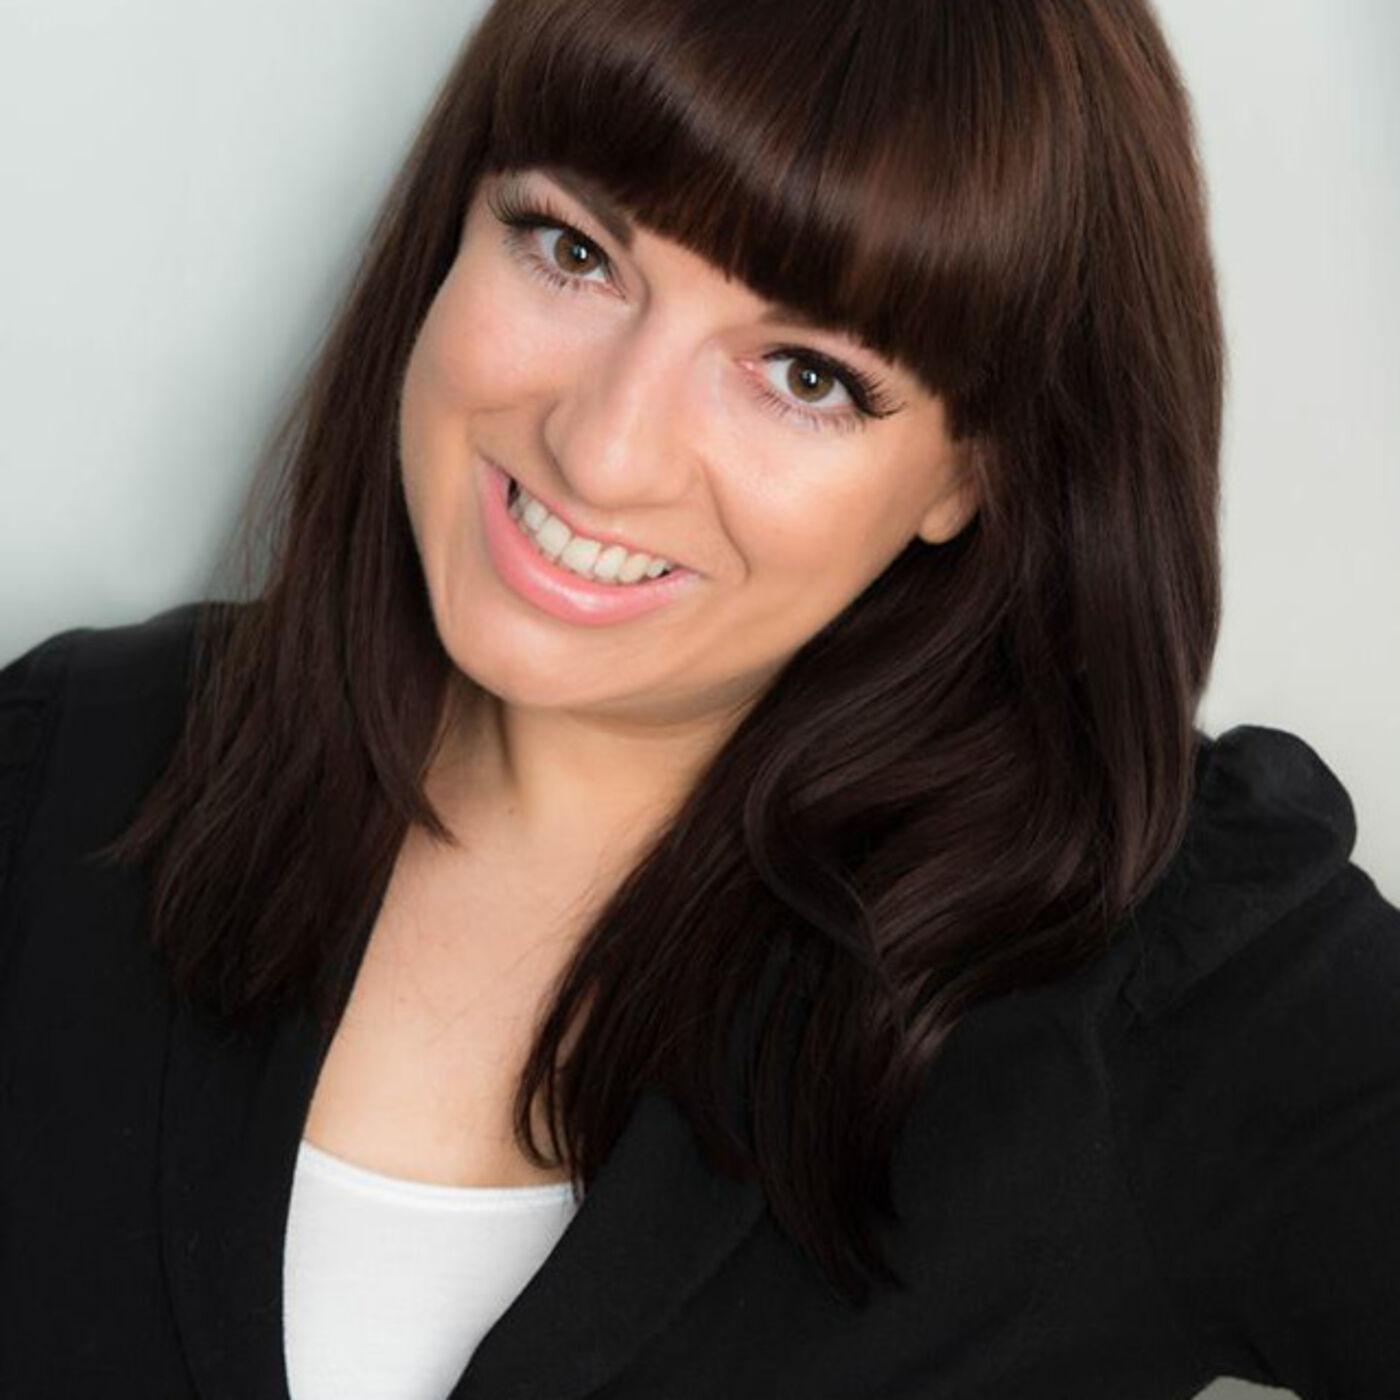 Clare Sloane - Eyes & Teeth - Voices of Variety - Season 9 - Edition 3